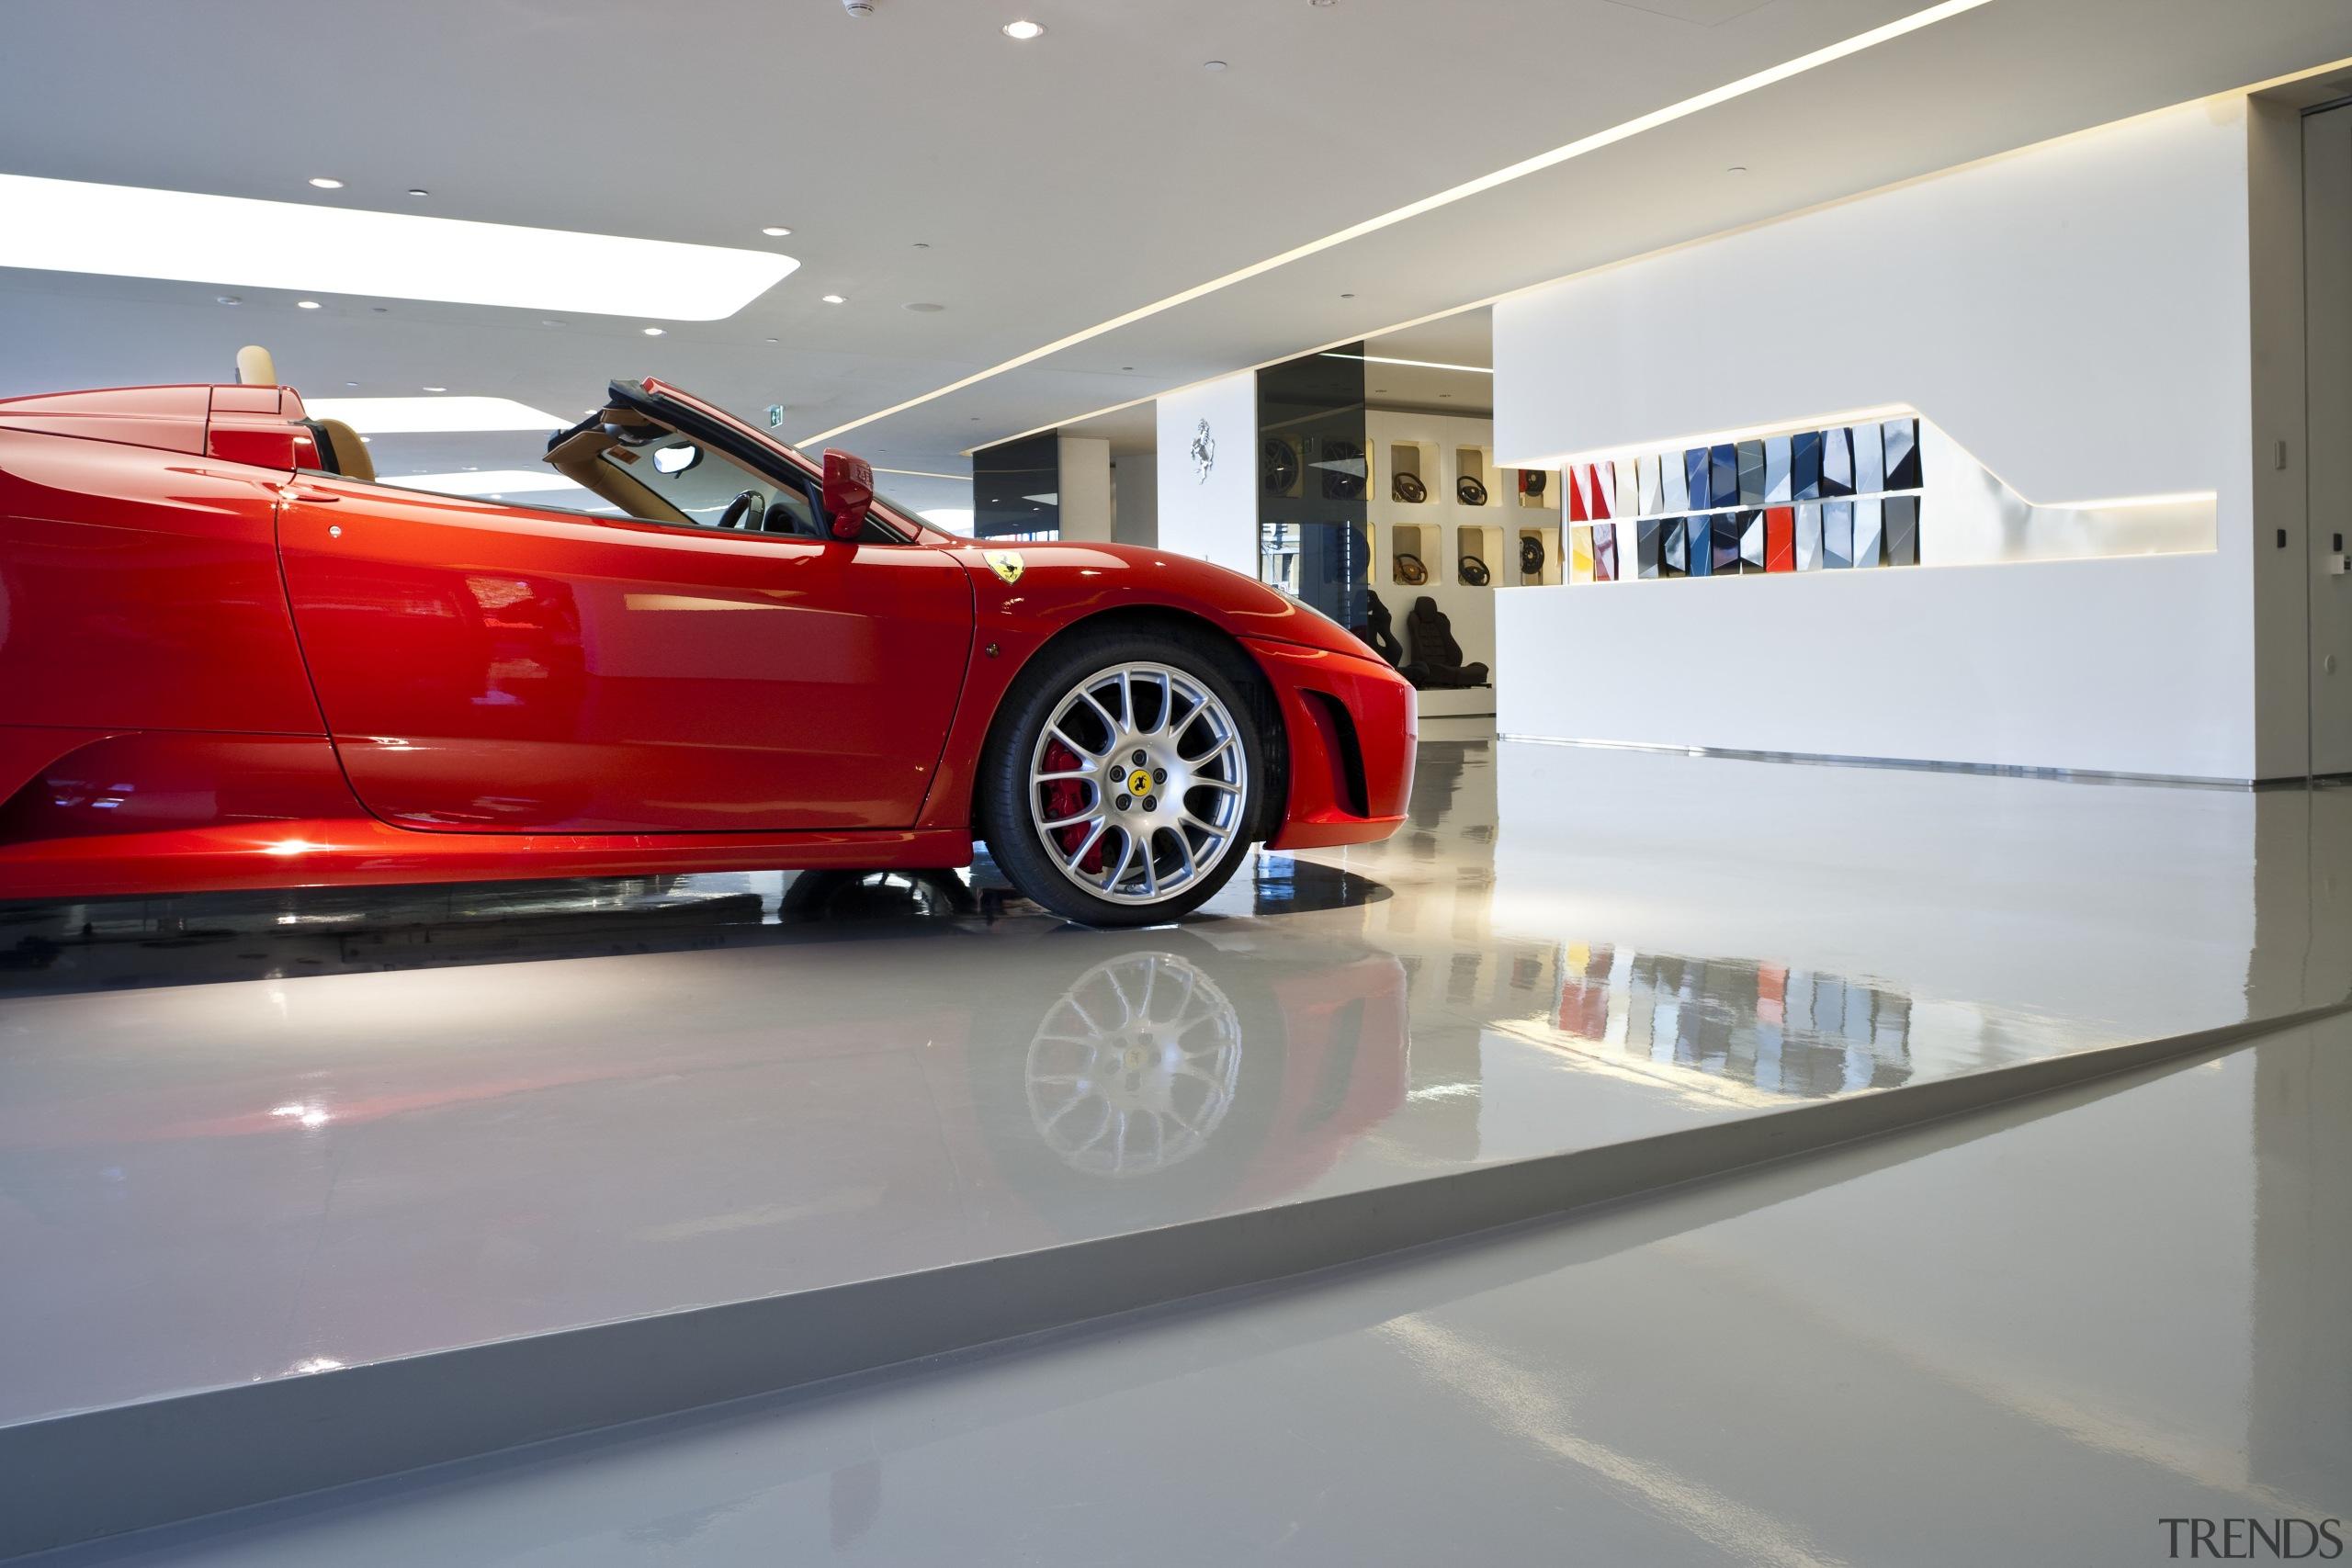 Ferrari Showroom in Australia - Ferrari Showroom in auto show, automotive design, car, luxury vehicle, motor vehicle, race car, sports car, supercar, vehicle, gray